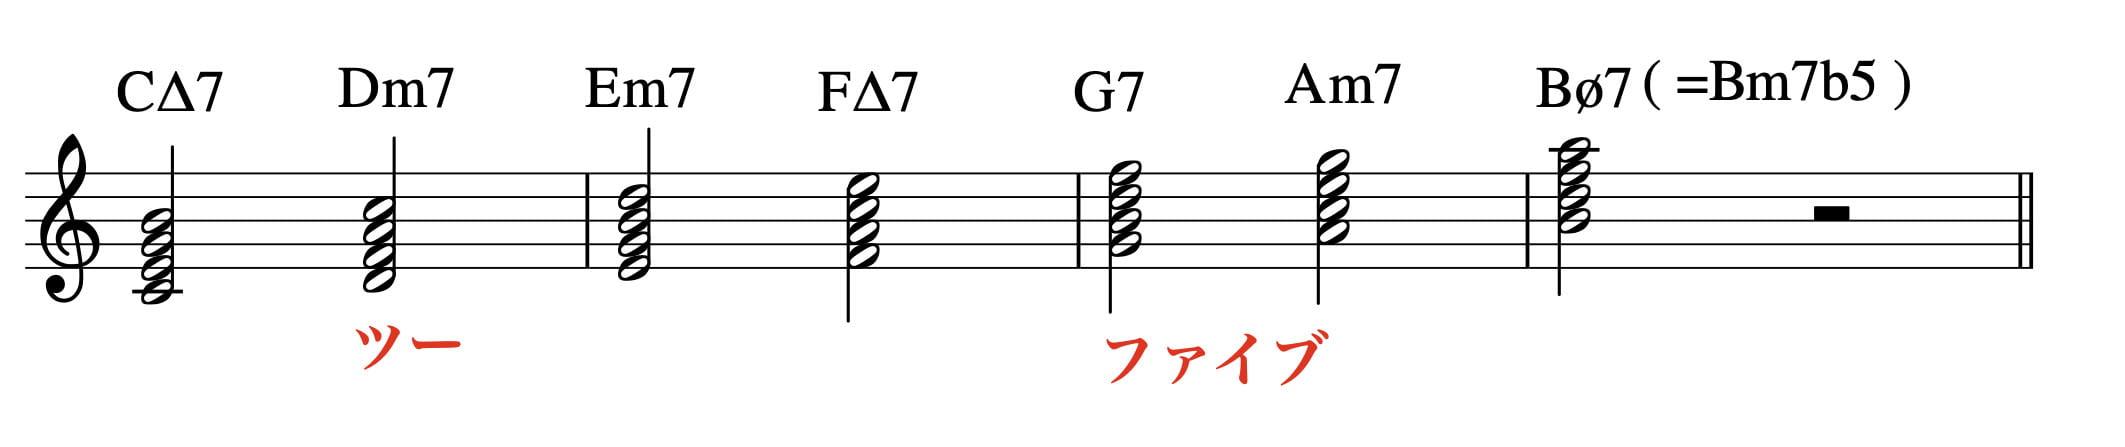 diatonic-chords